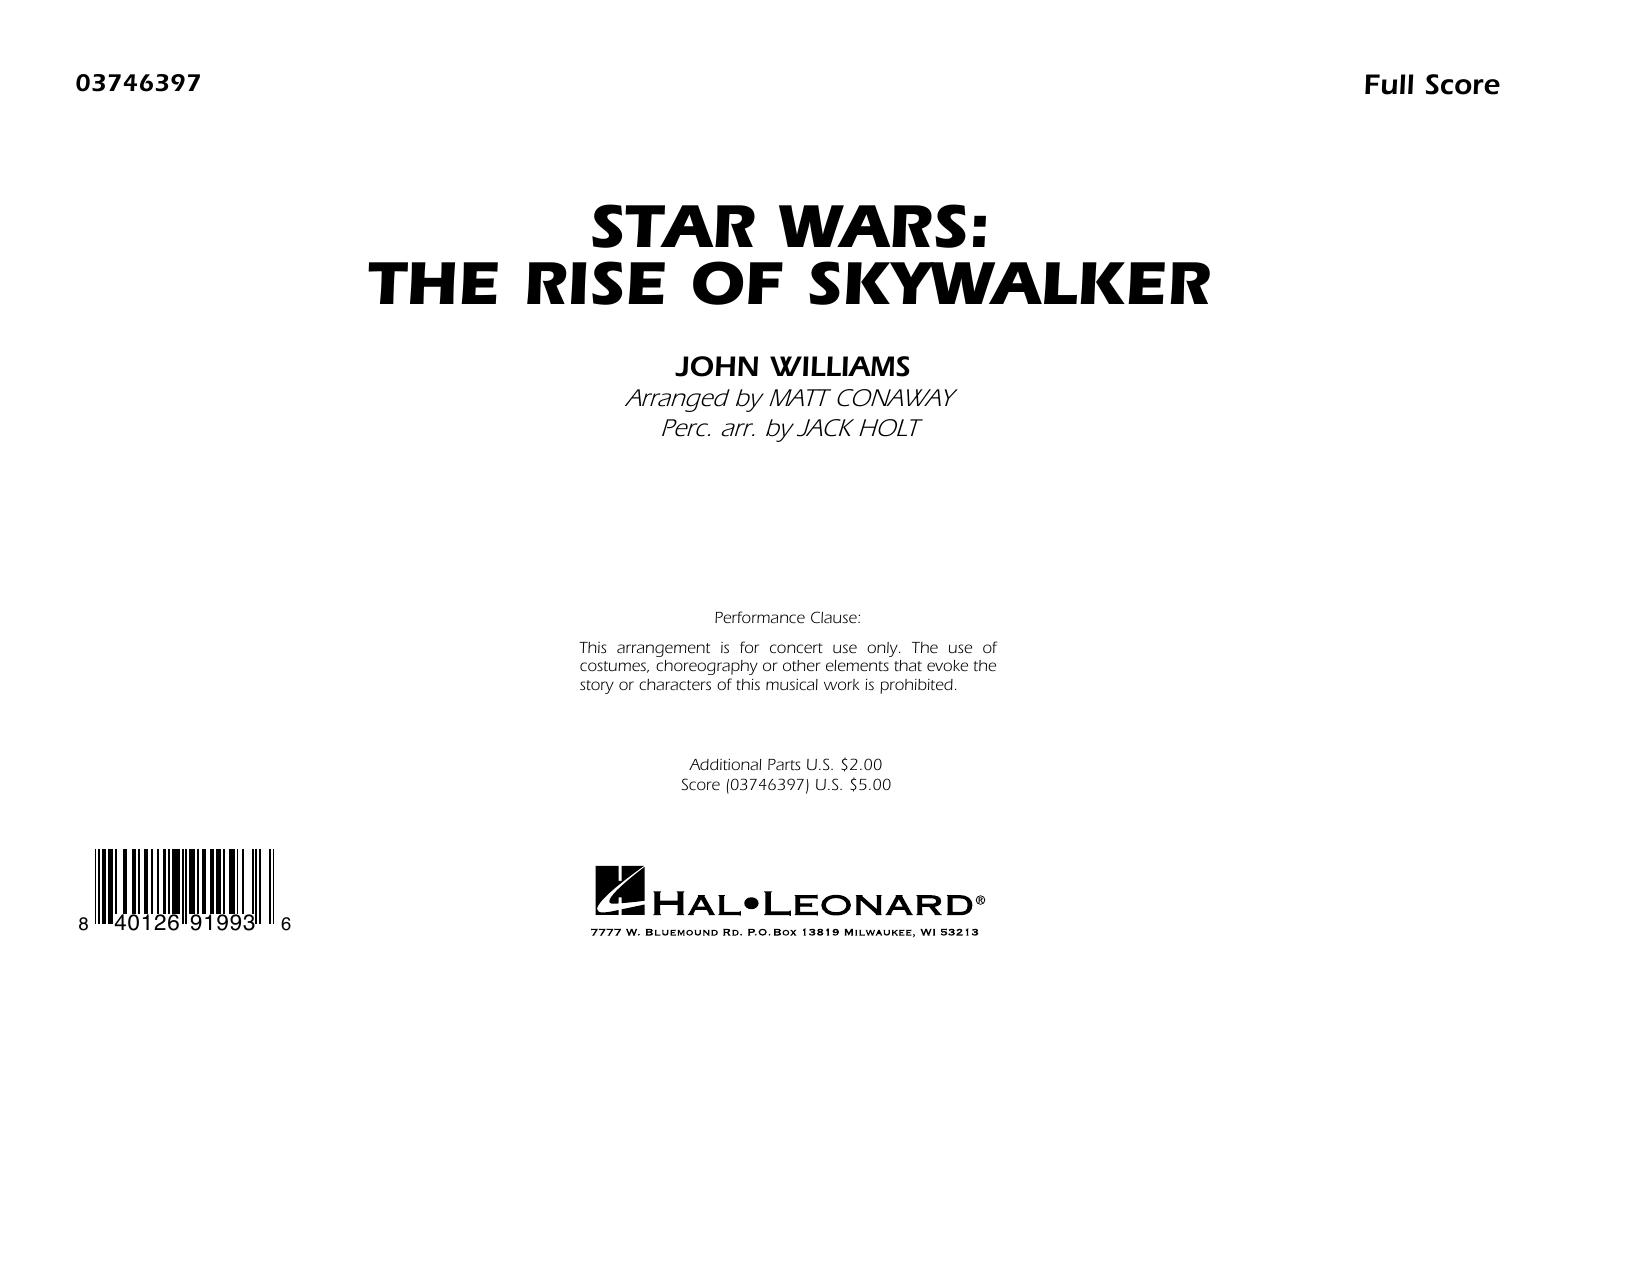 Star Wars: The Rise of Skywalker (arr. Matt Conaway) - Conductor Score (Full Score) Sheet Music